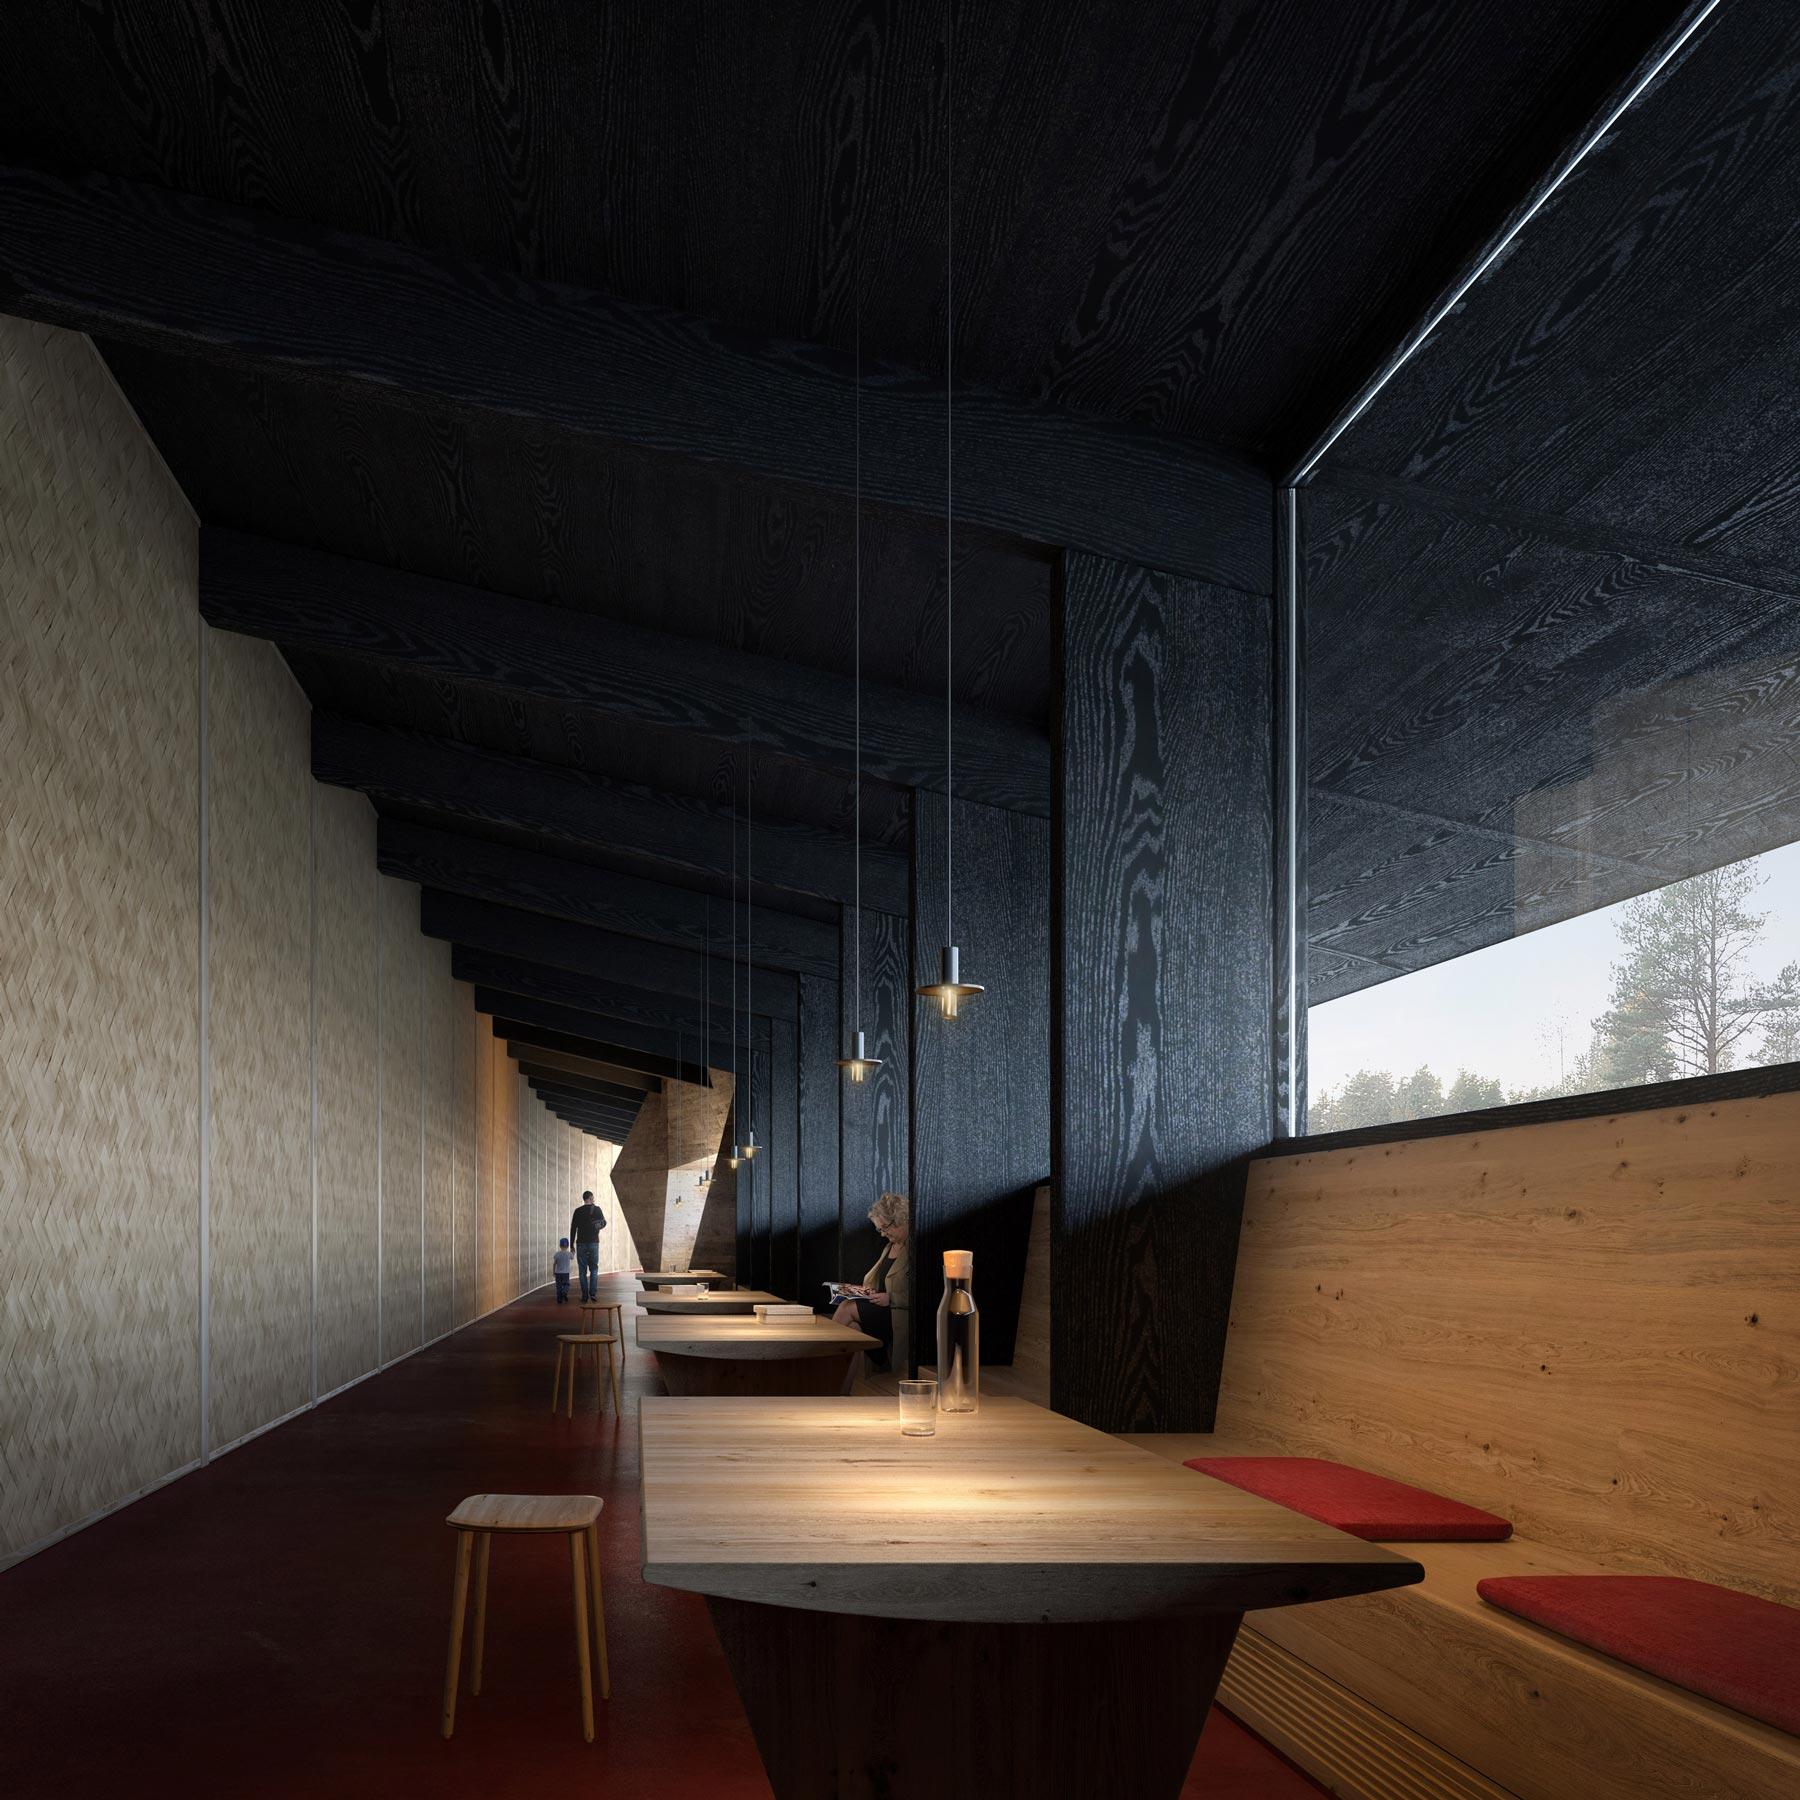 caruso_mainardi architetti | Skogfinsk Museum, Grue Finnskog (NO)